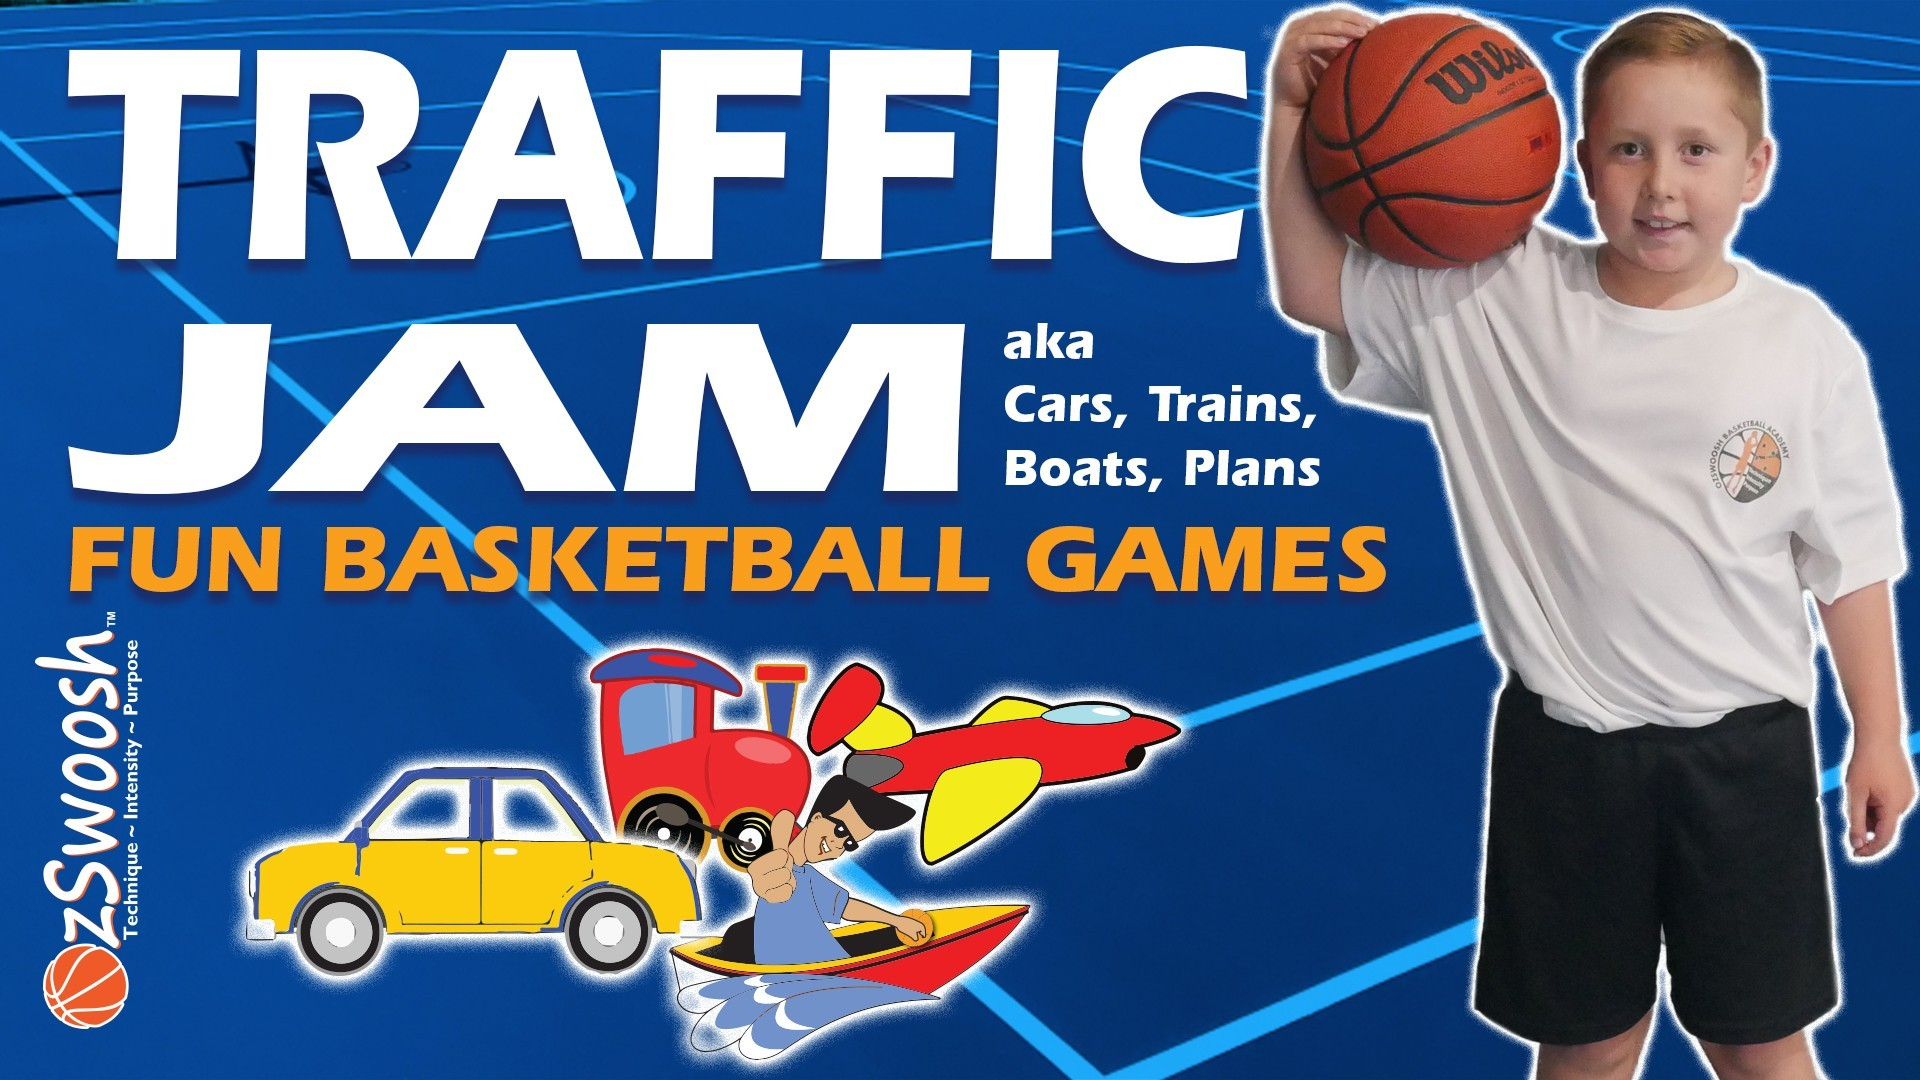 Fun Youth Basketball Drills For Kids - Traffic Jam (Warmup Game)